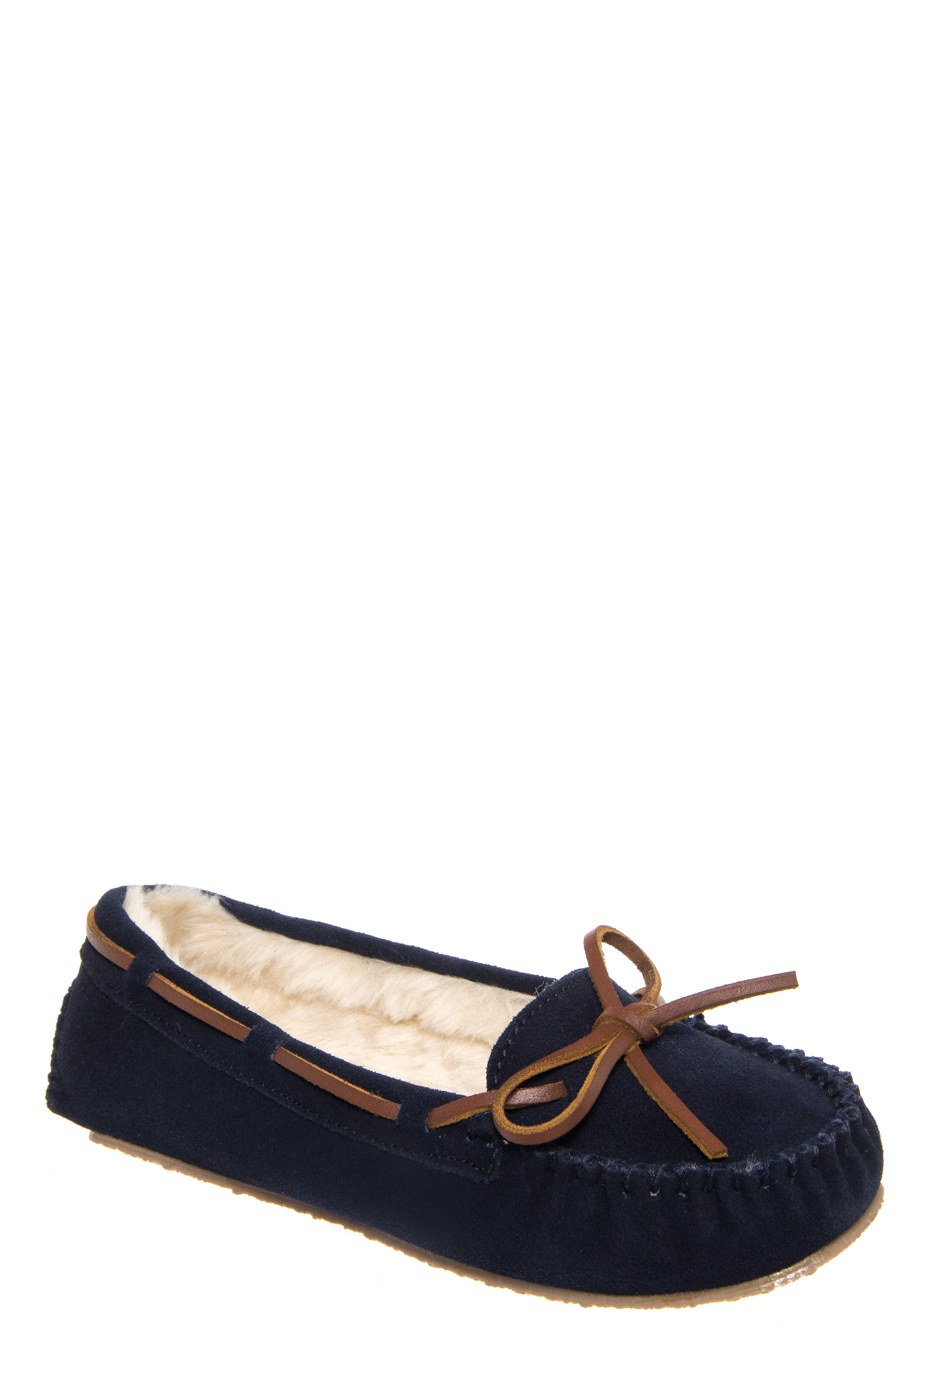 Minnetonka Cally Slipper Moccasins Flats Shoe